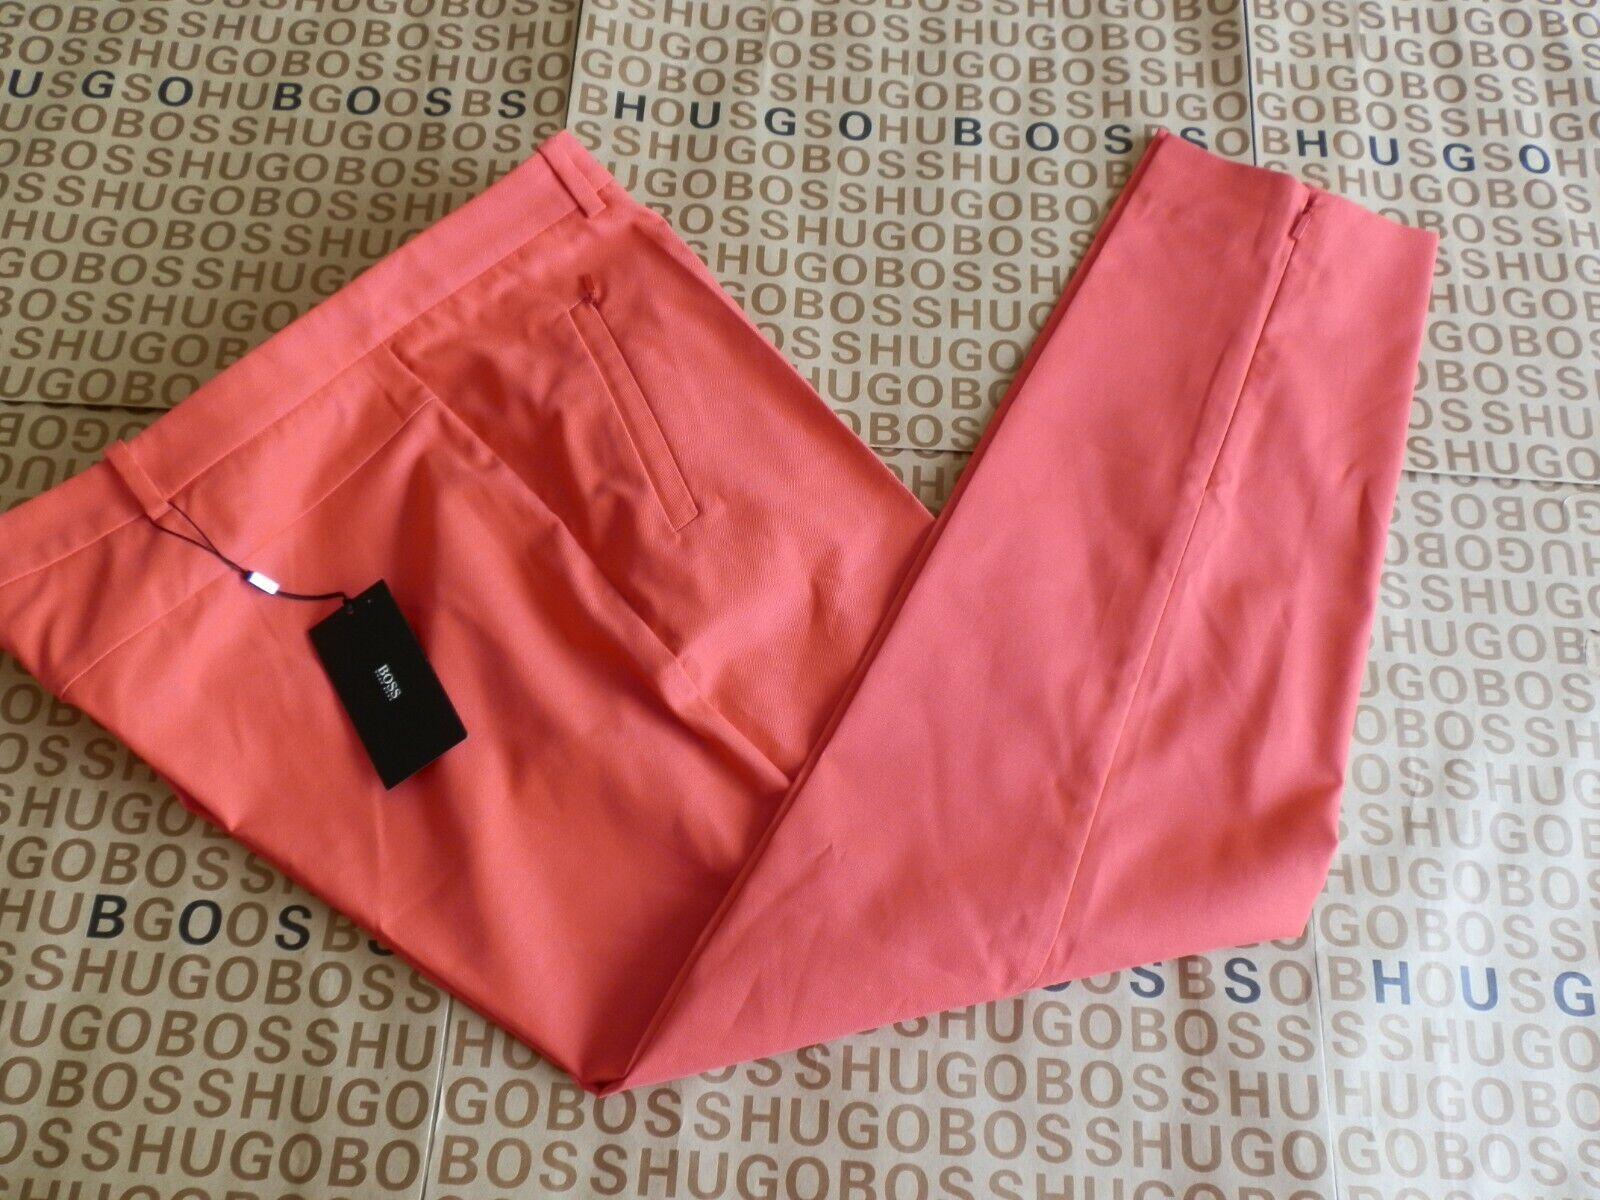 NEW HUGO BOSS WOMANS LADIES RED DESIGNER SMART SUIT TROUSERS 18 rrp